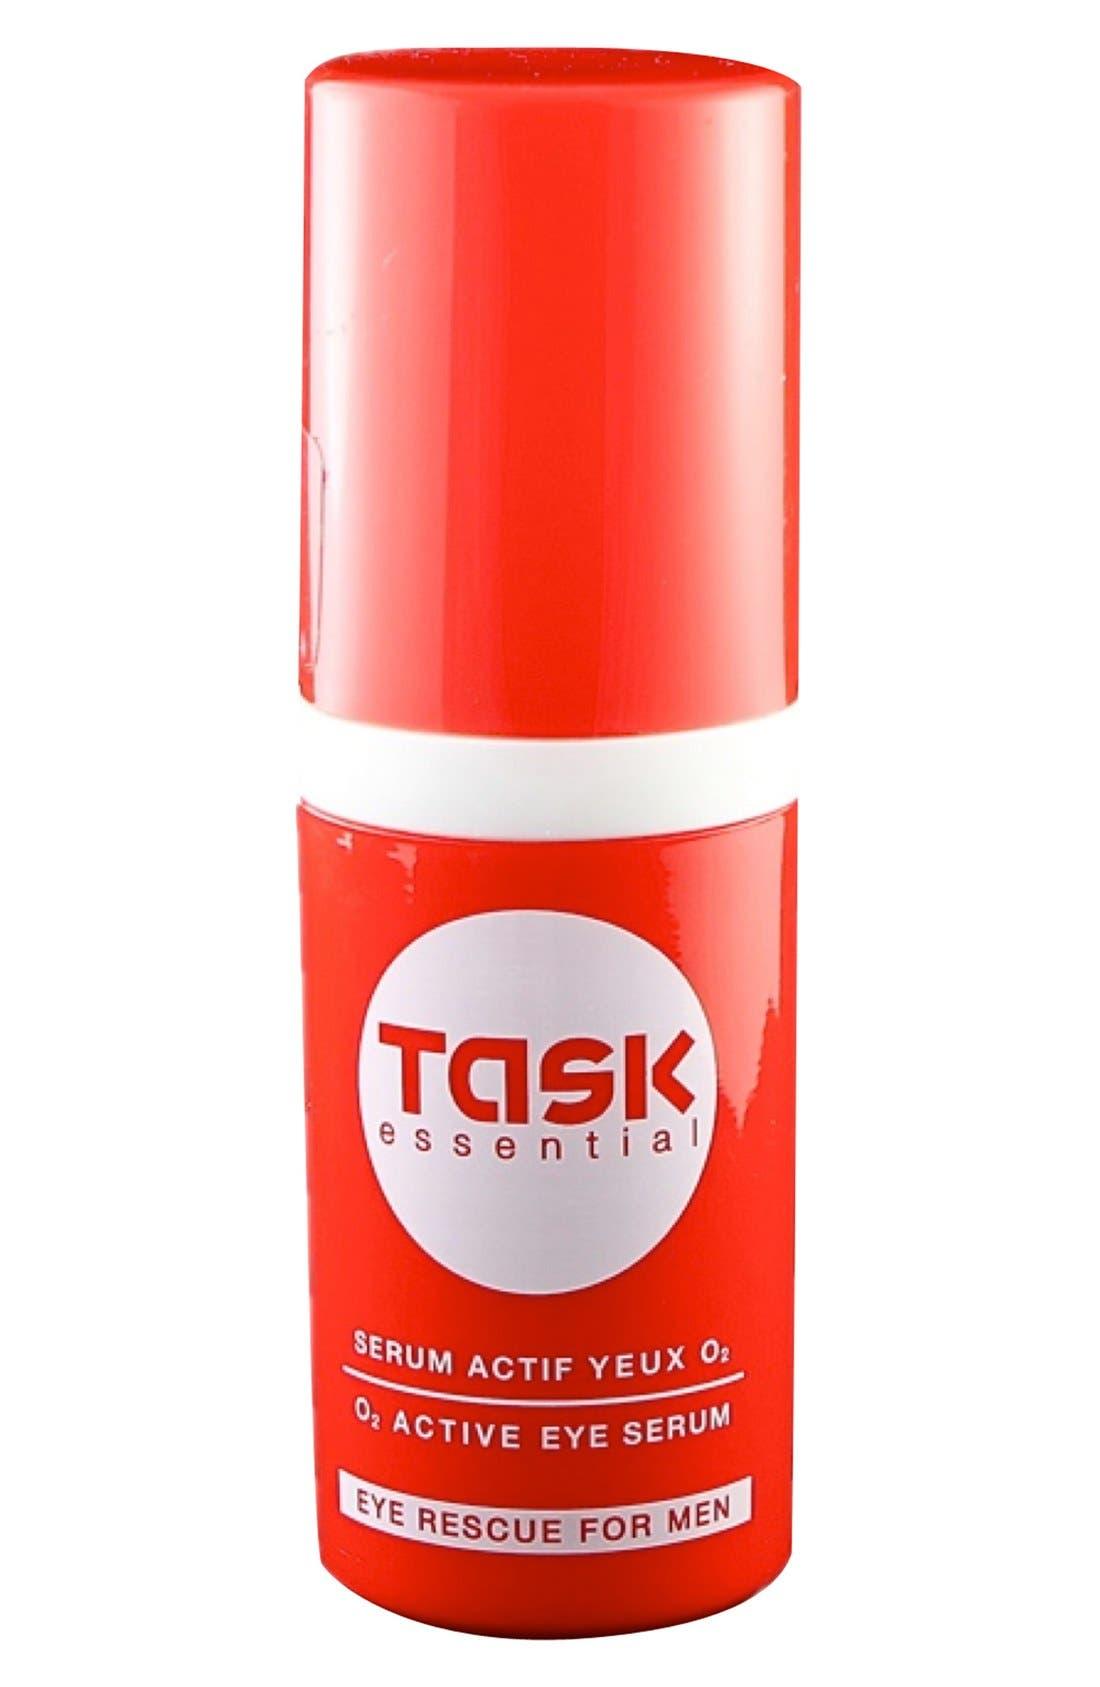 Task Essential O2 Active Eye Serum